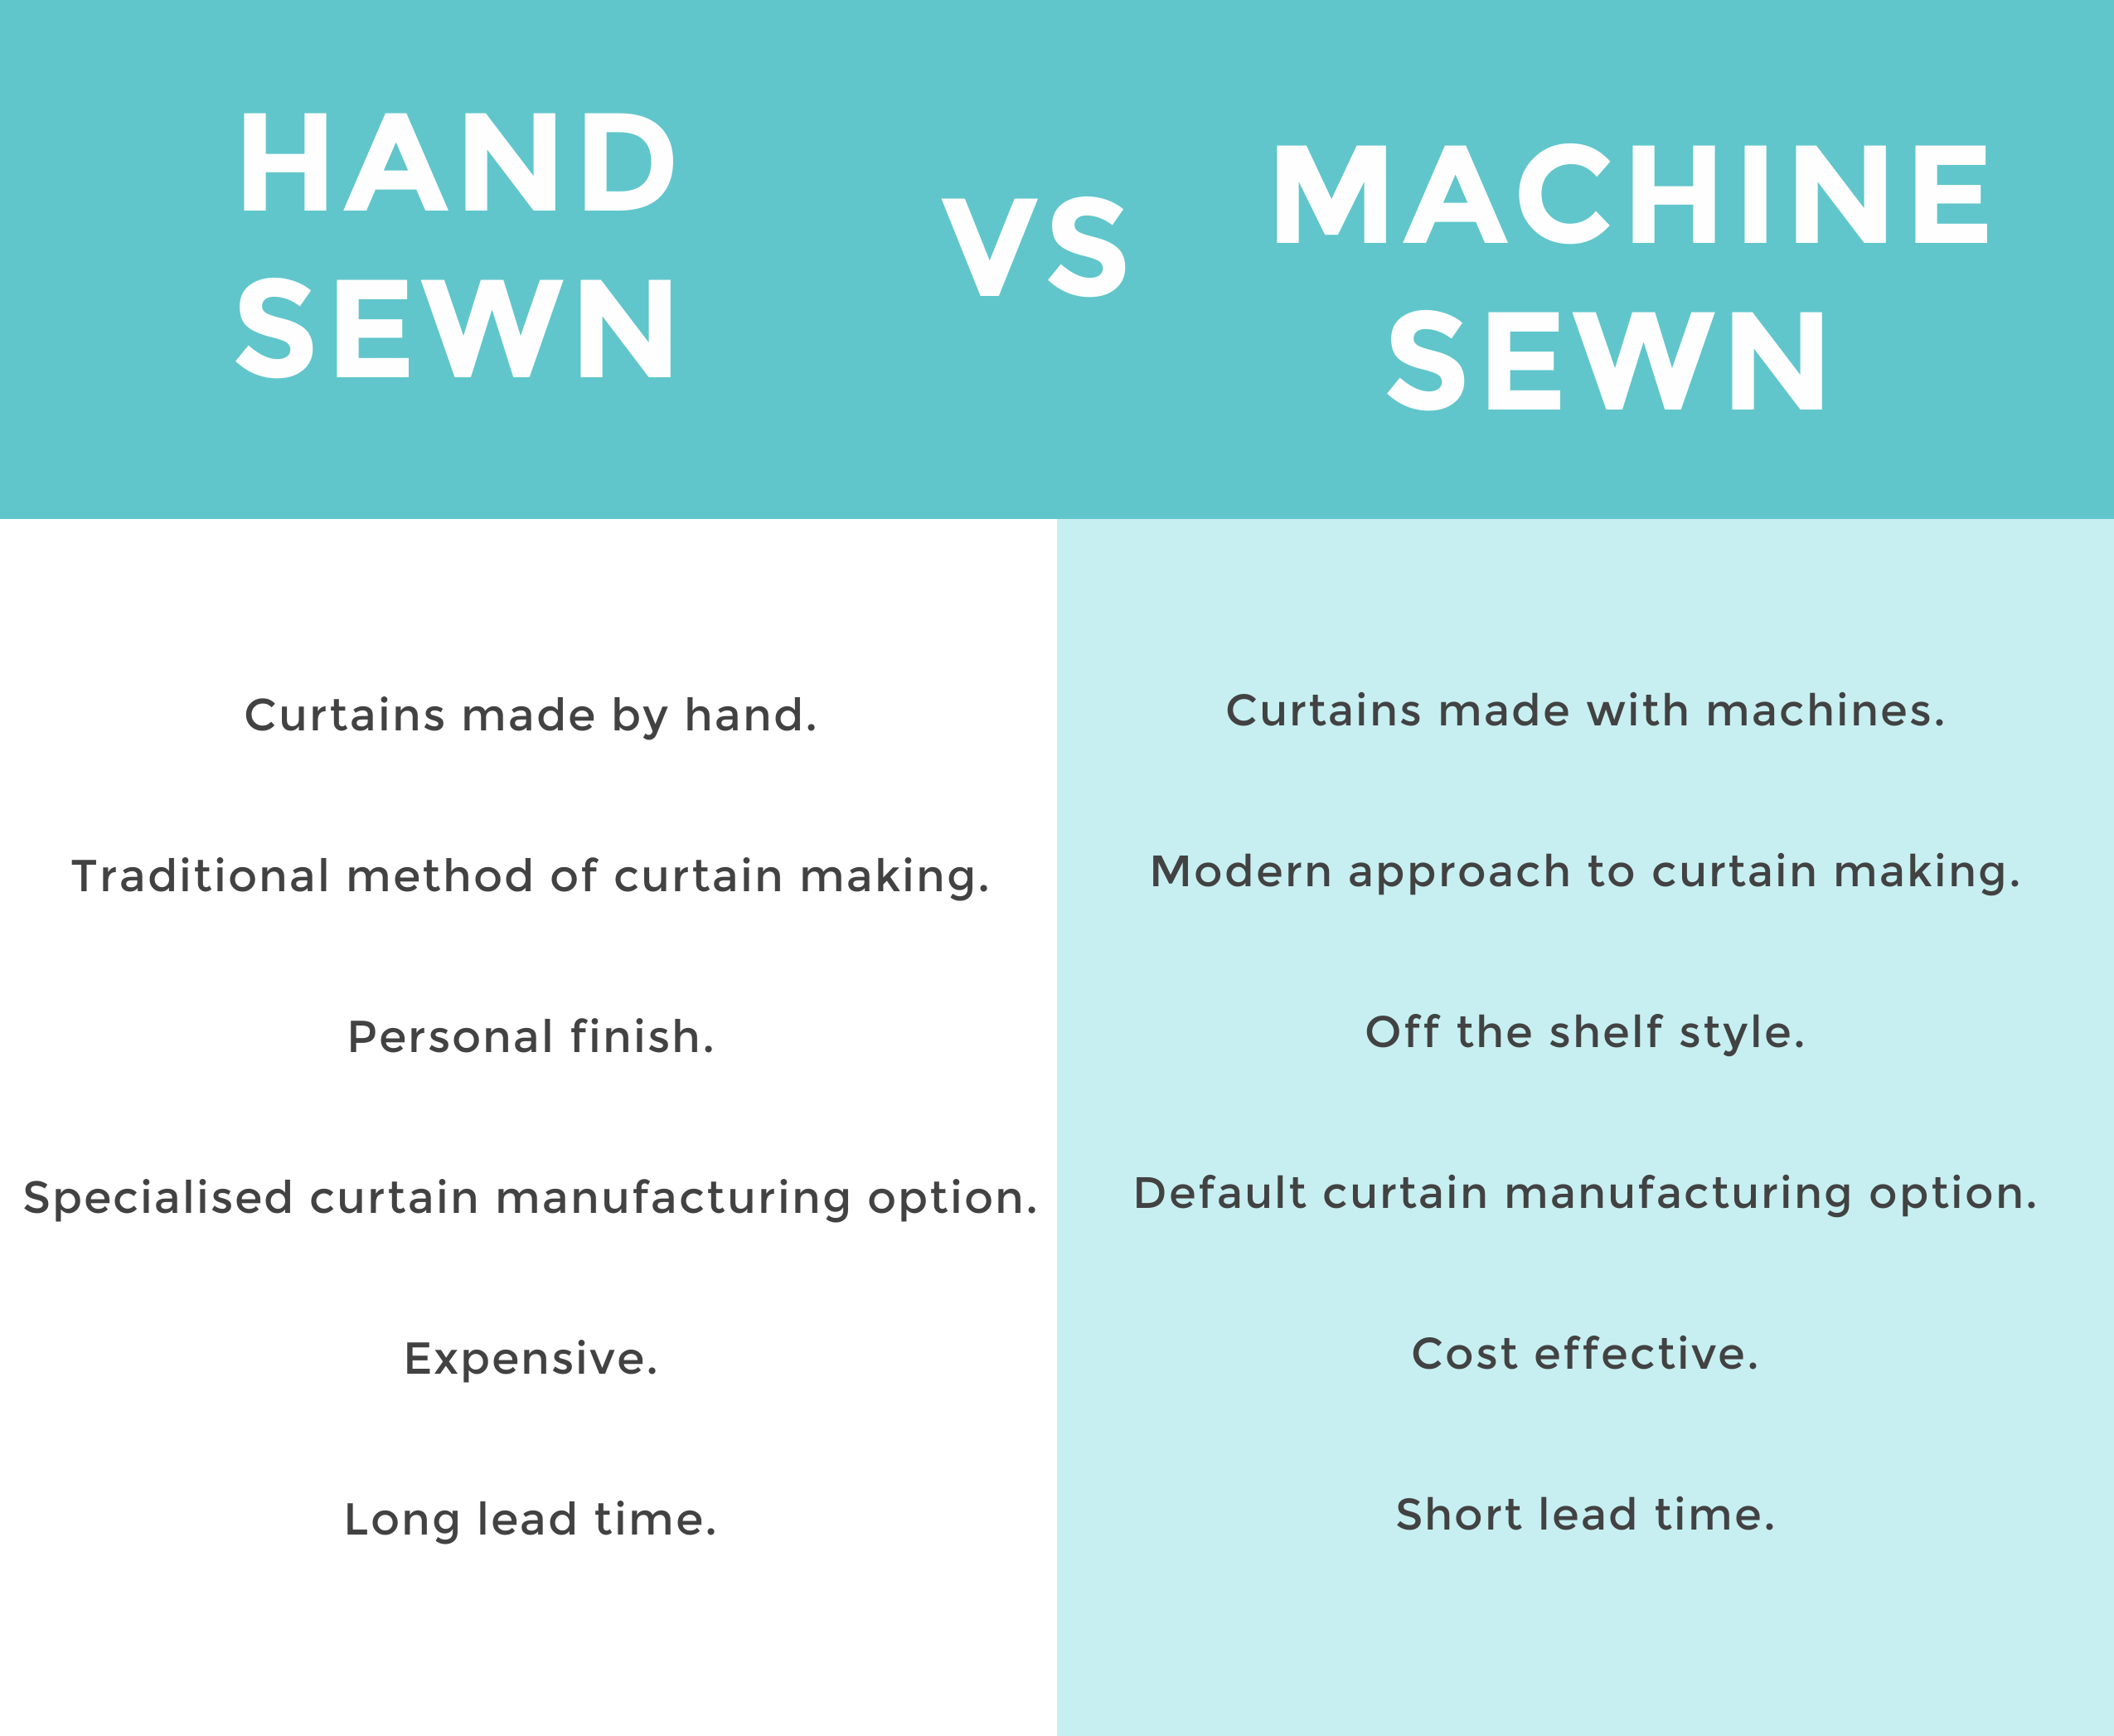 Curtain manufacturing comparison infographic